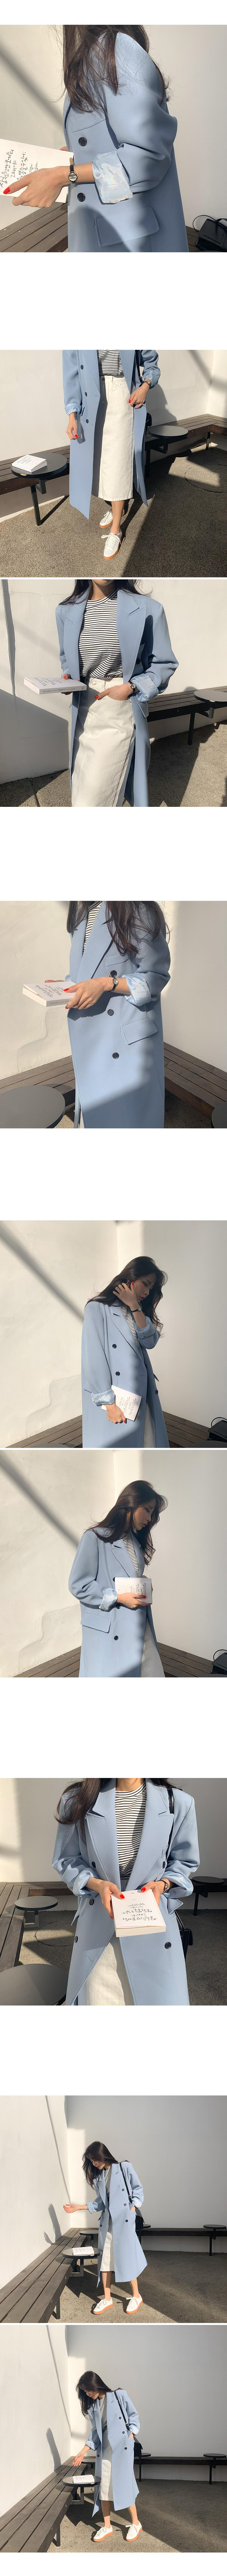 Misumi double long coat